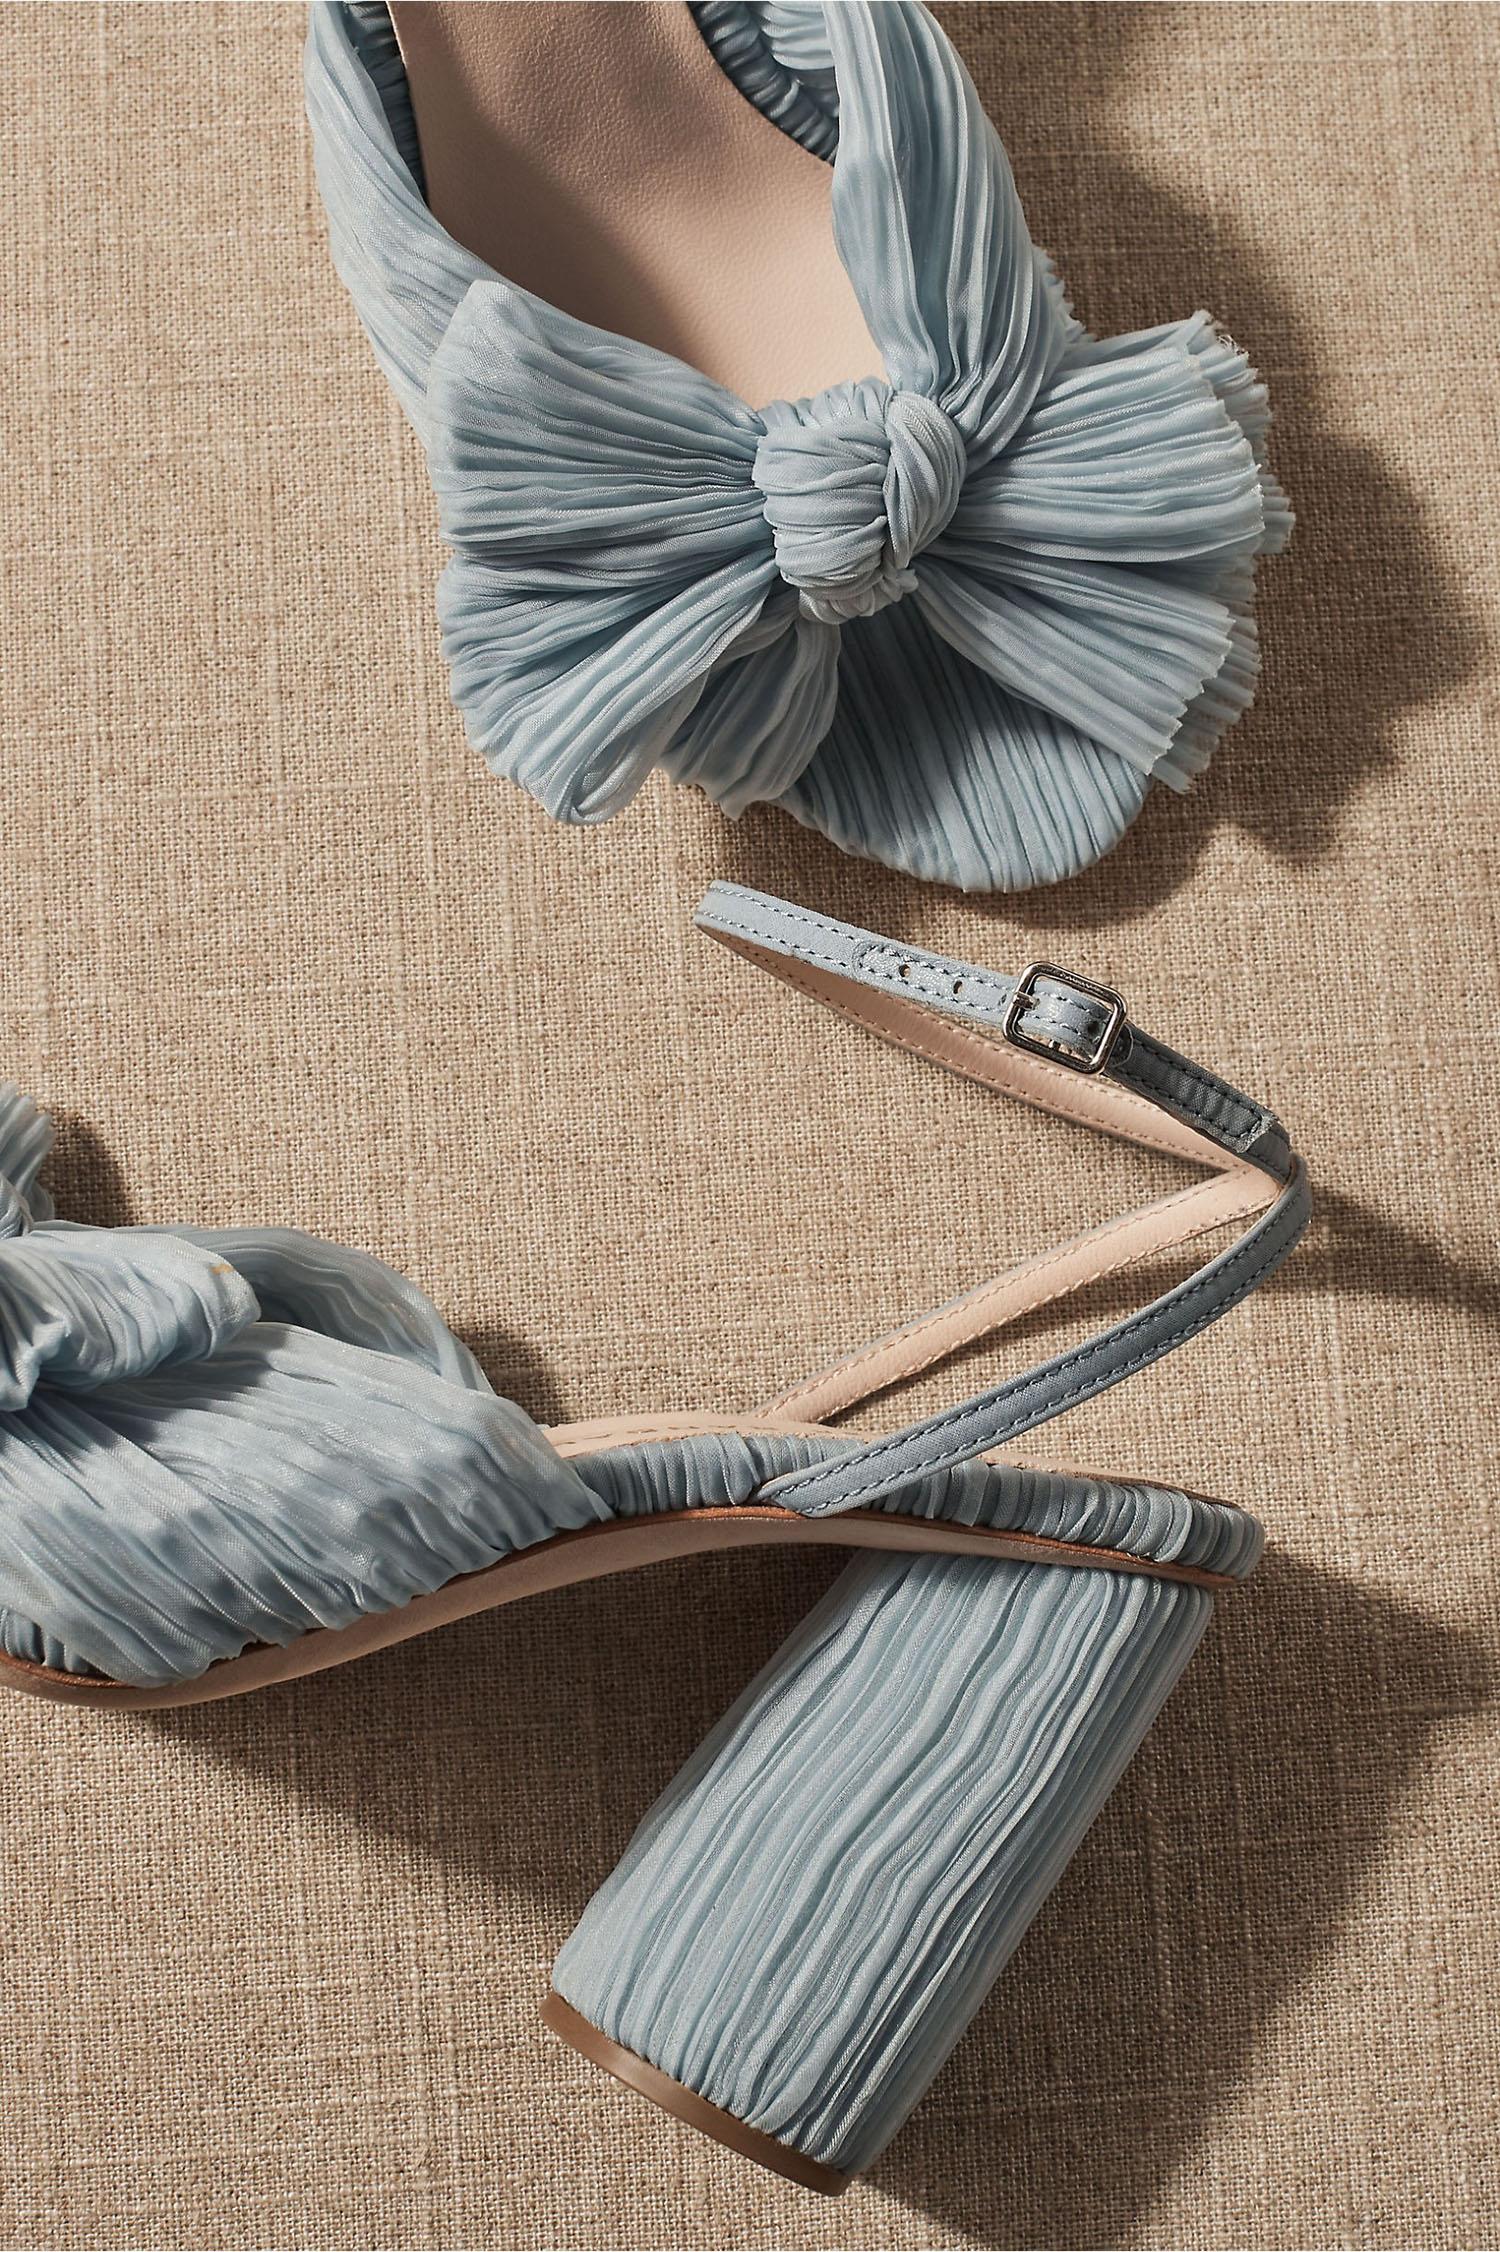 powder blue ruffled Loeffler Randall BHLDN wedding heels